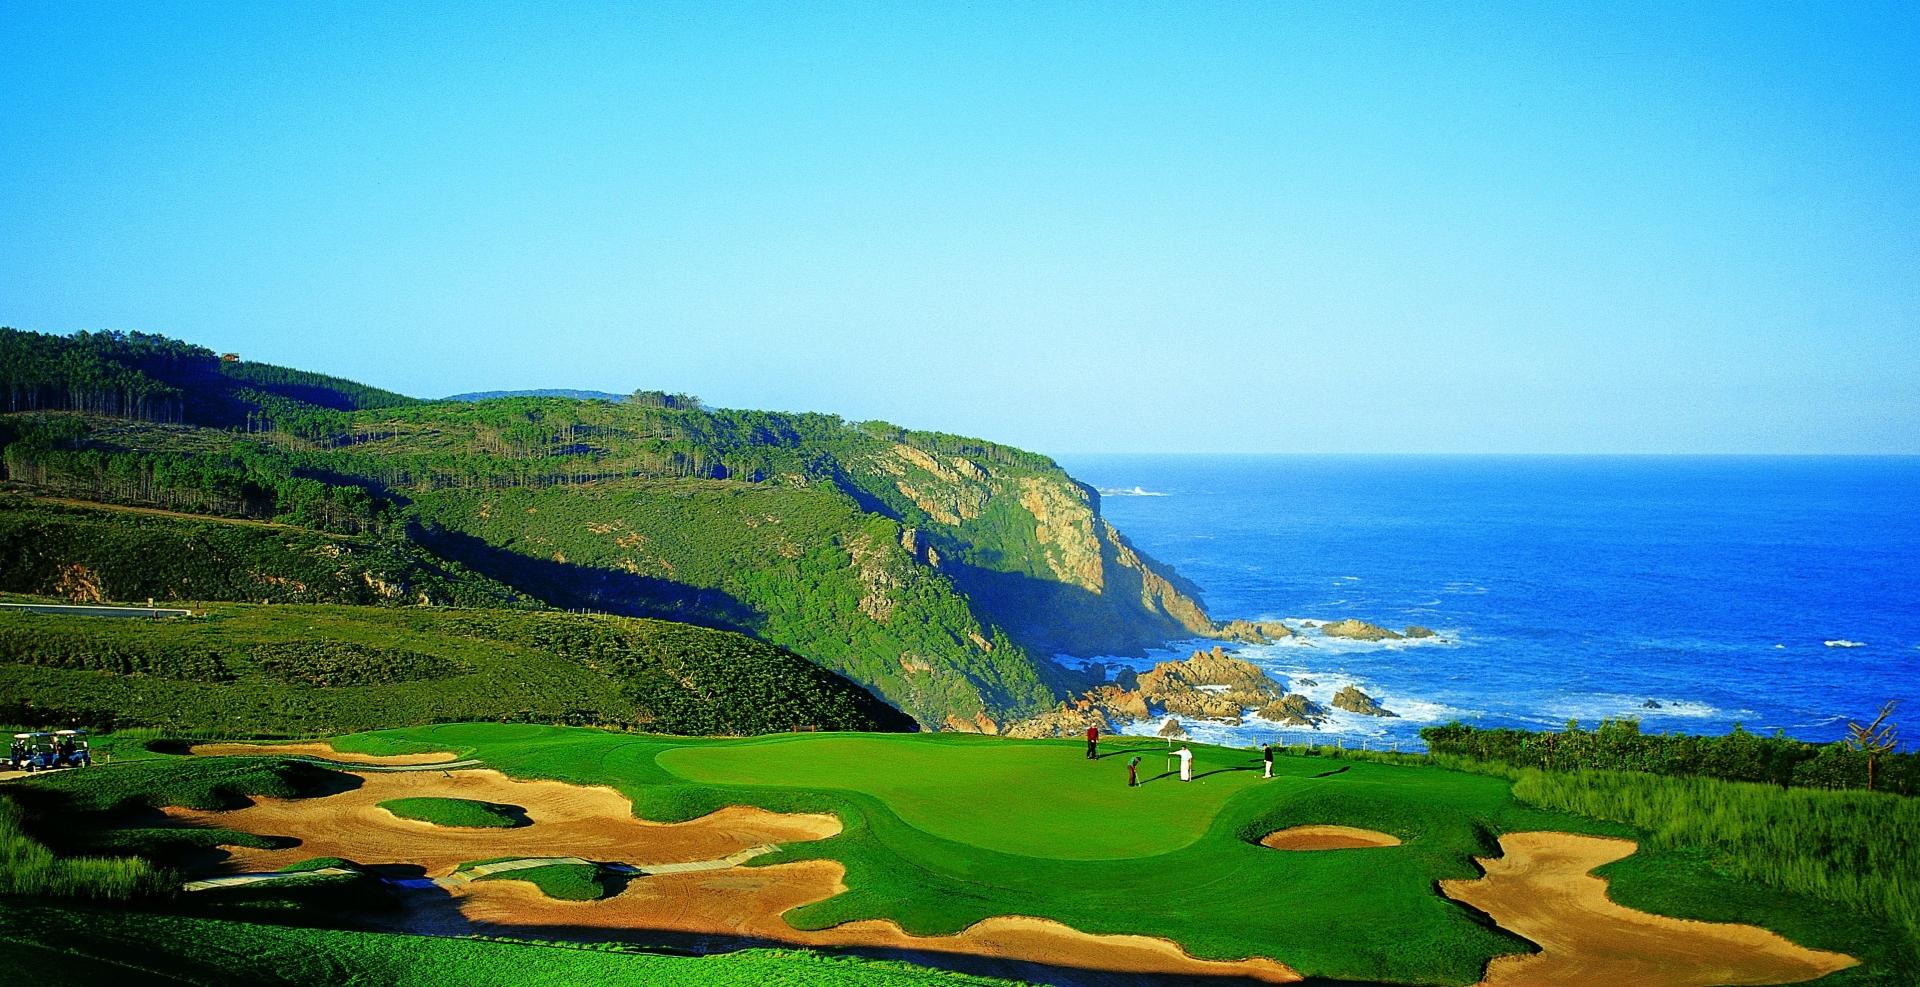 Mister Goodlife Signature Maatwerk Golfreizen in Zuid-Afrika